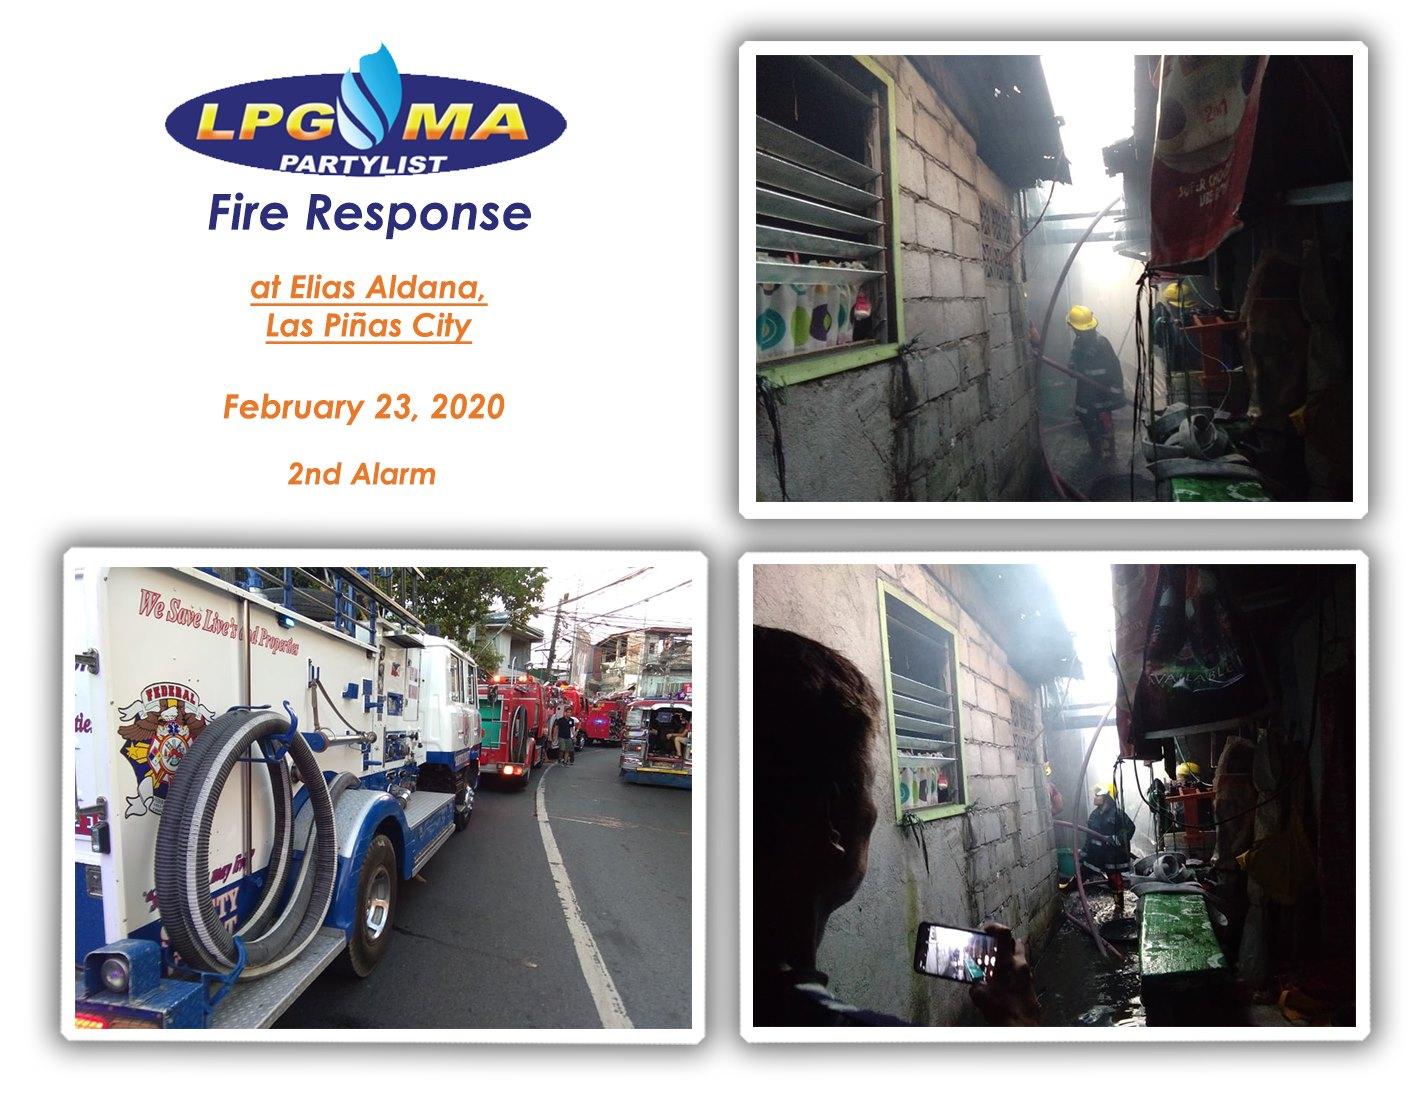 lpgma-fire-response-laspinas